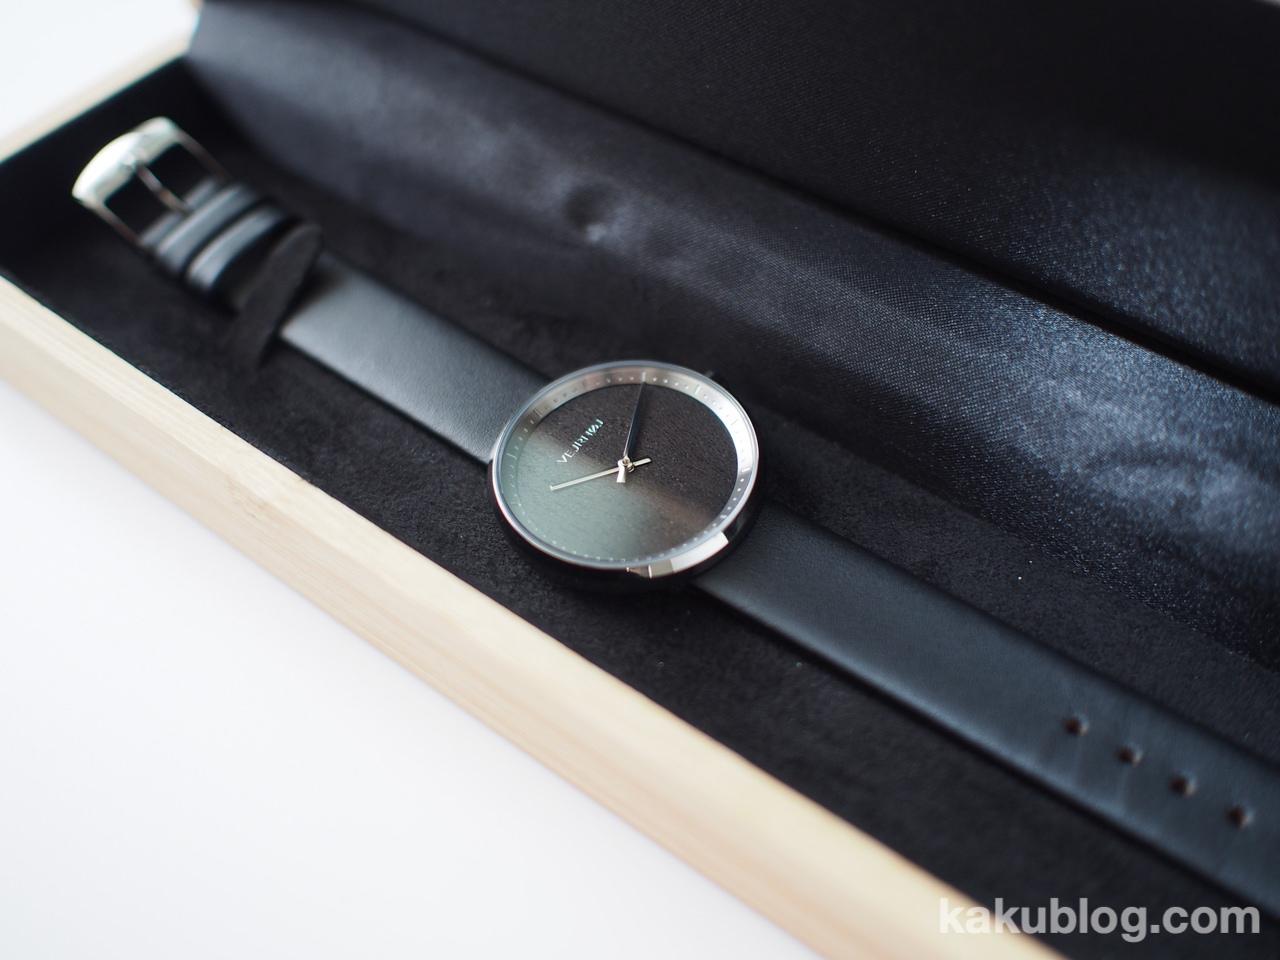 VEJRHOJ(ヴェアホイ)の口コミ評判!圧倒的質感の木製腕時計